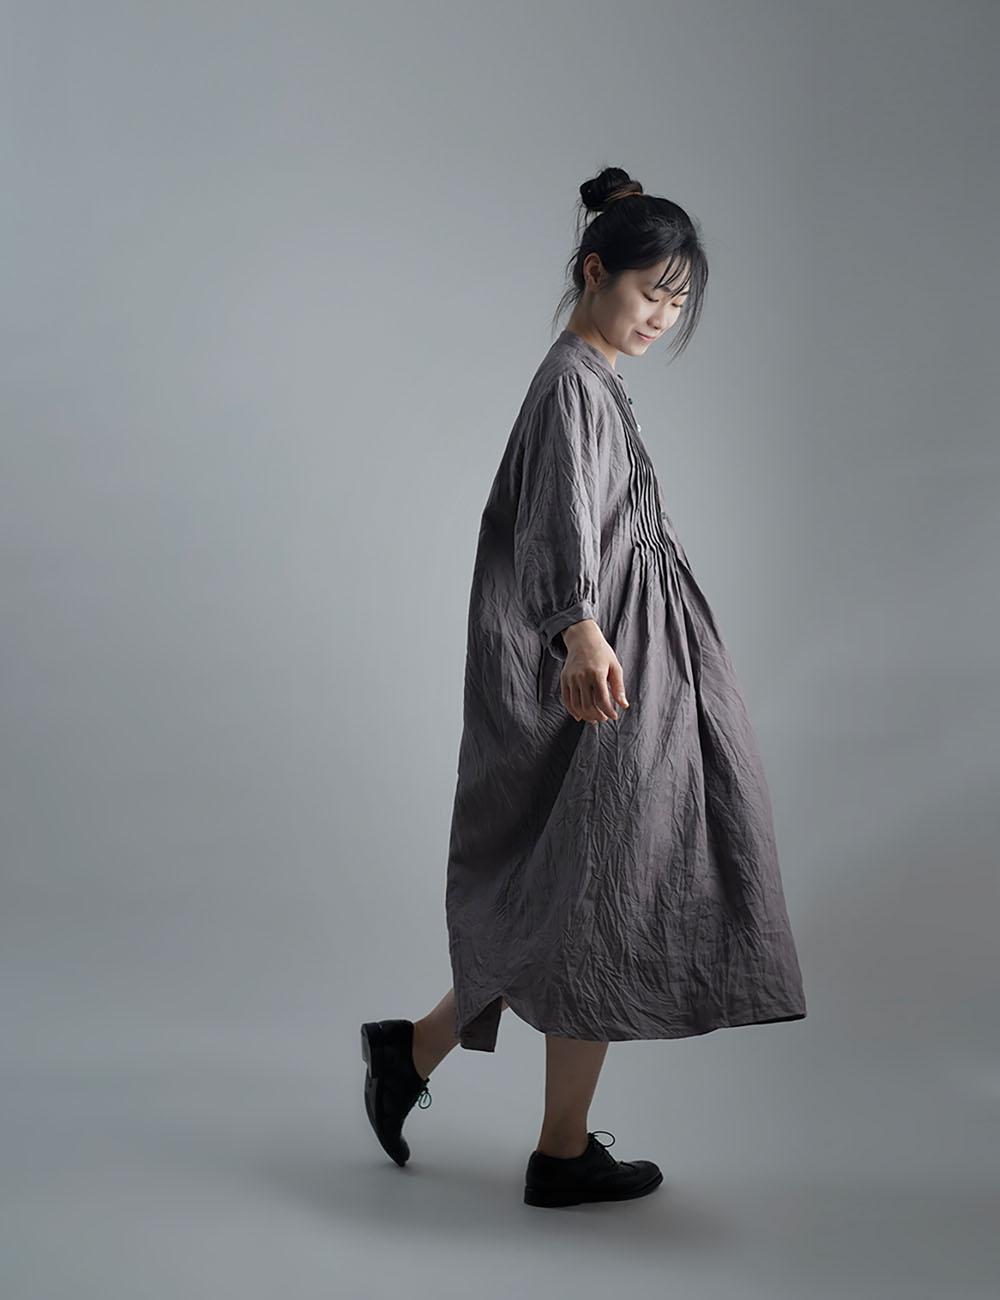 【wafu】Linen Dress 超高密度リネン ピンタックワンピース /茶鼠(ちゃねずみ) a006b-cnz1